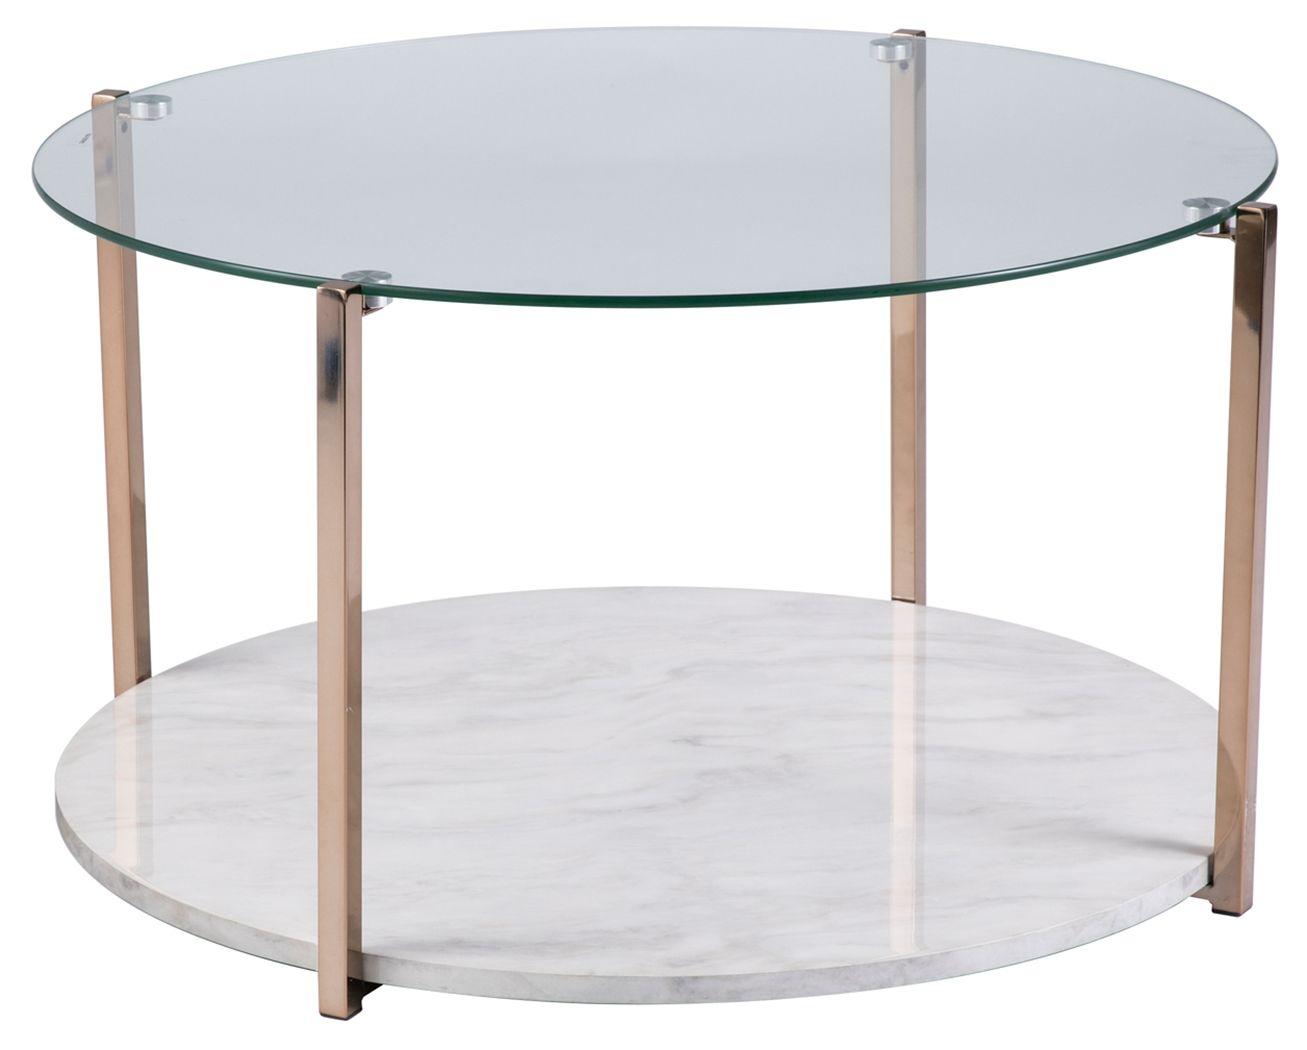 Glass Coffee Table Ashley Furniture Homestore Glass Coffee Table Coffee Table Glass Top Coffee Table [ 1050 x 1307 Pixel ]